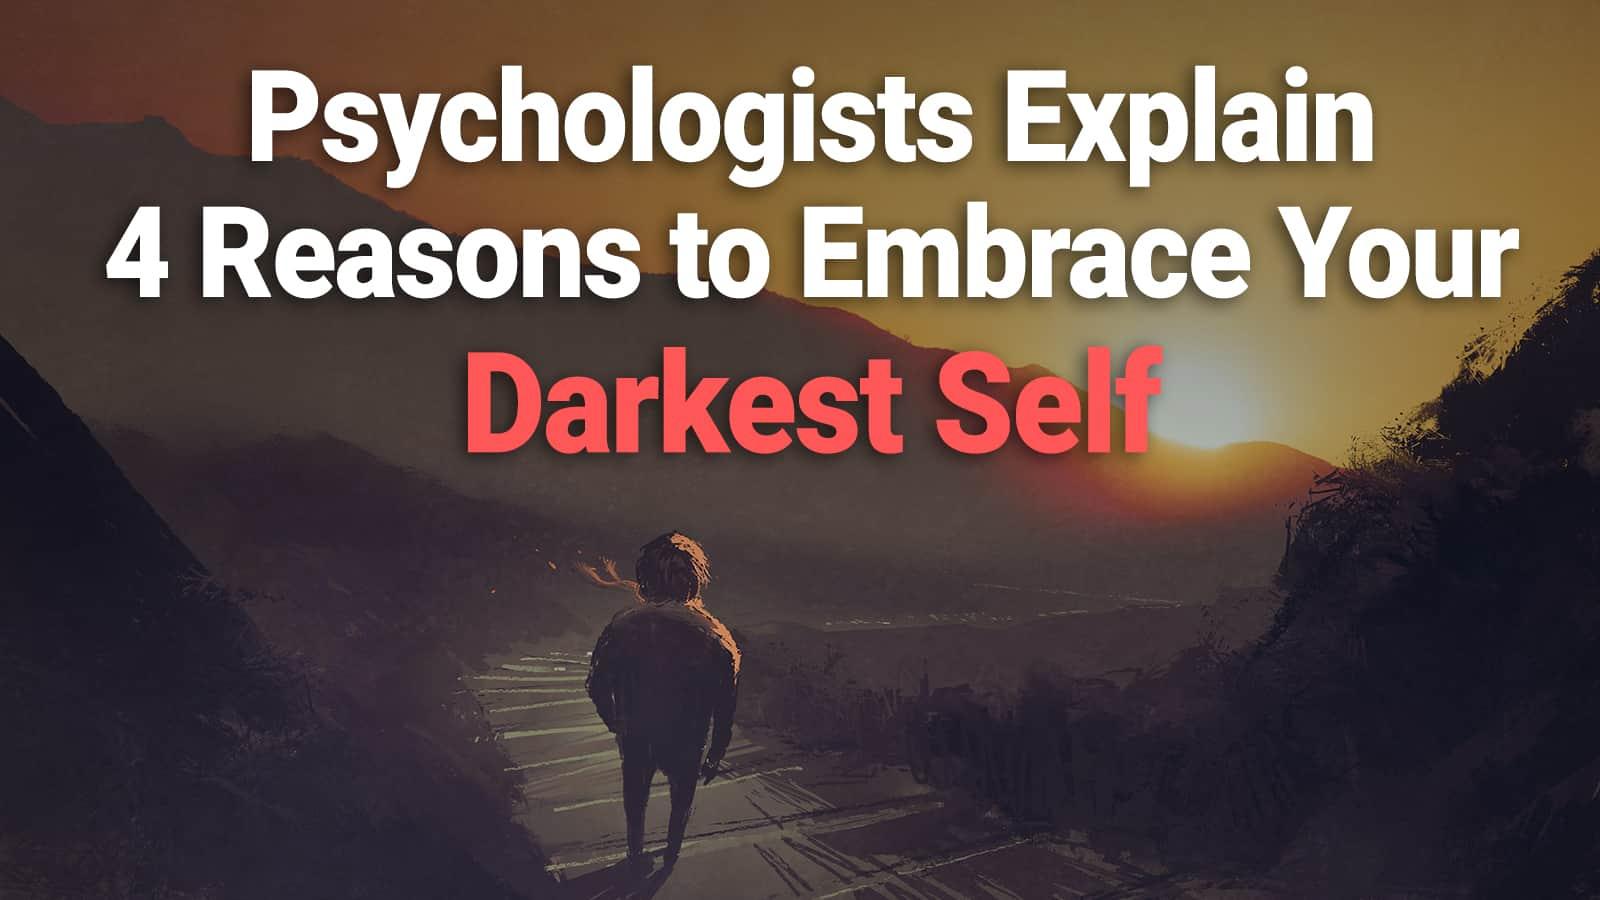 darkest self